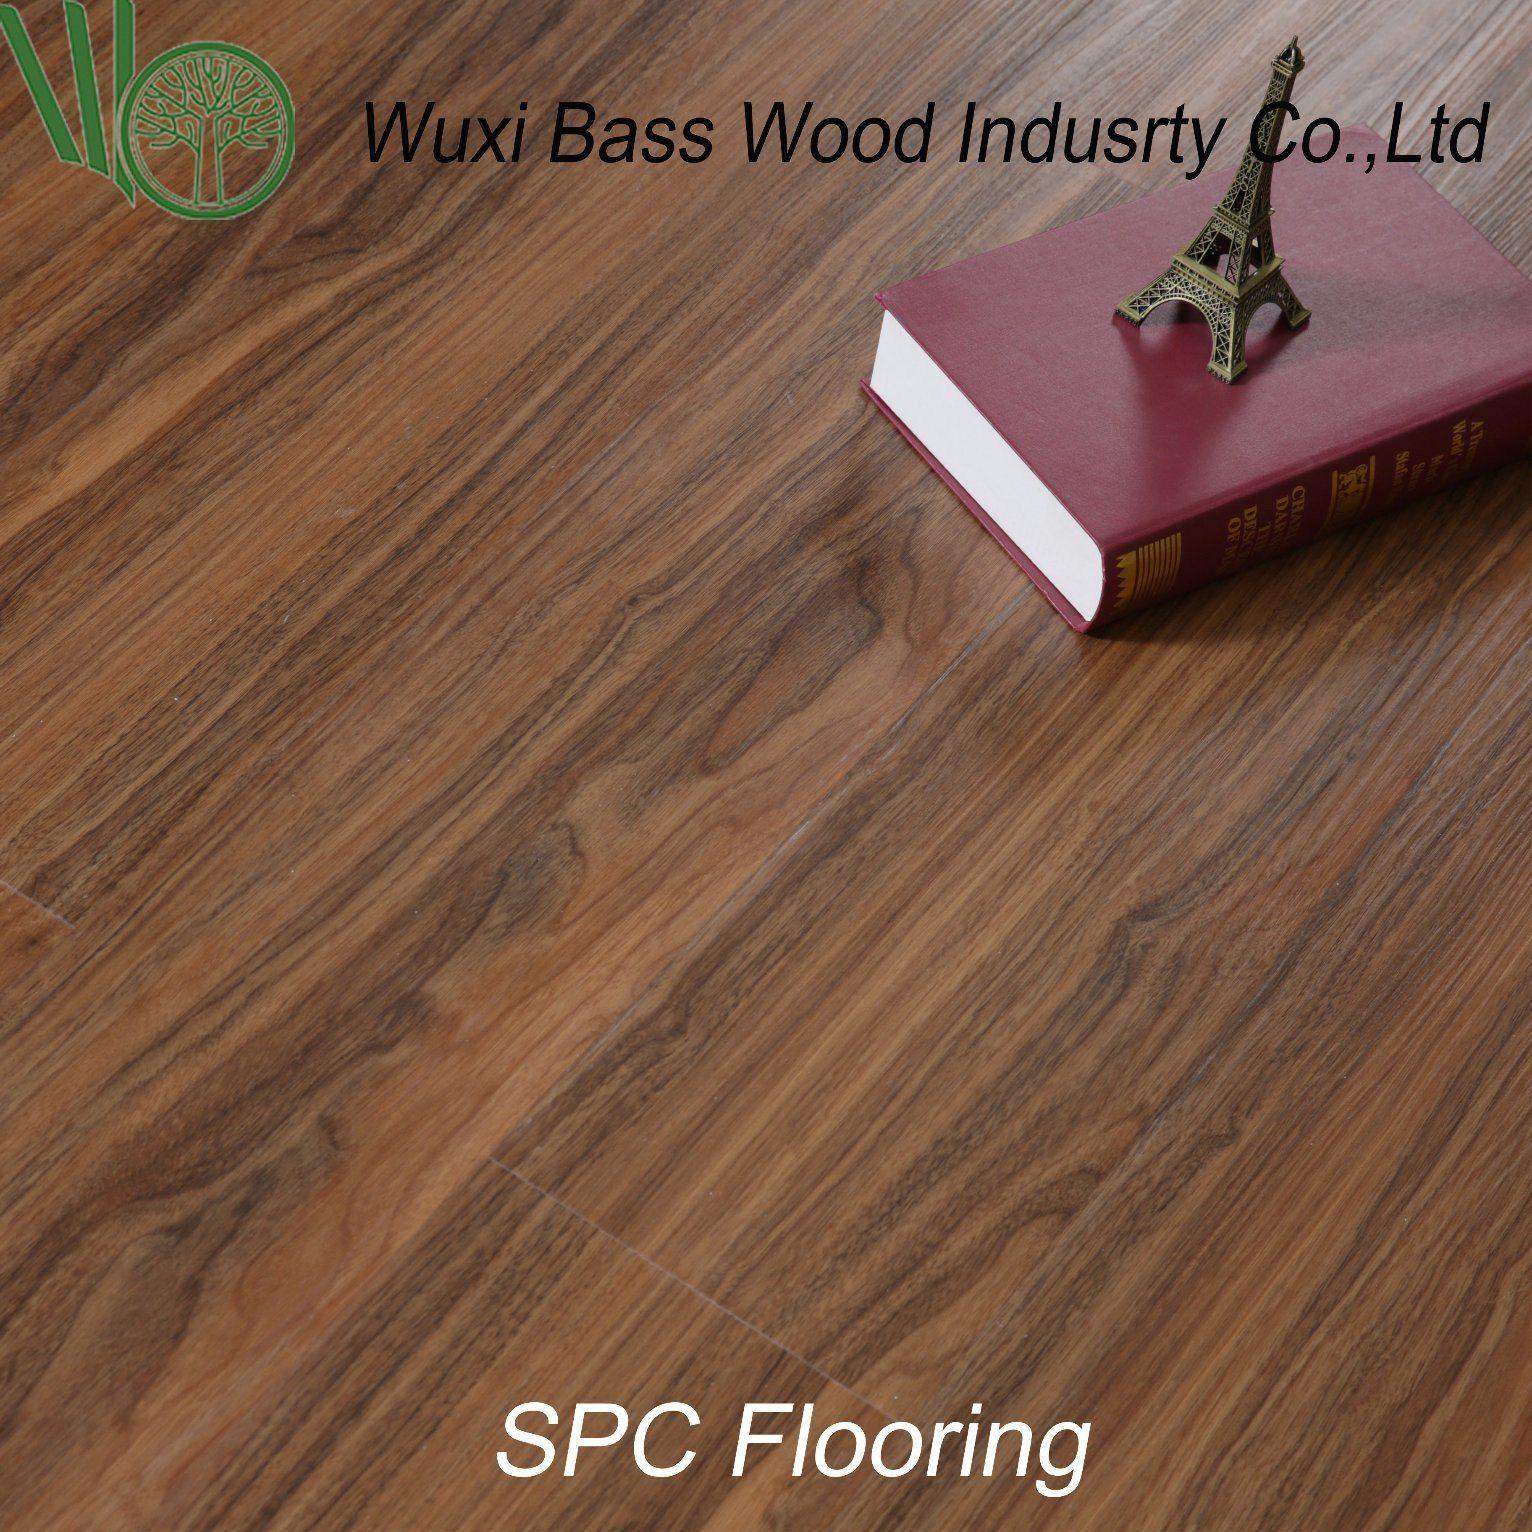 20 Pics Review Laminate Flooring Formaldehyde Free And Description In 2020 Flooring Laminate Flooring Laminate